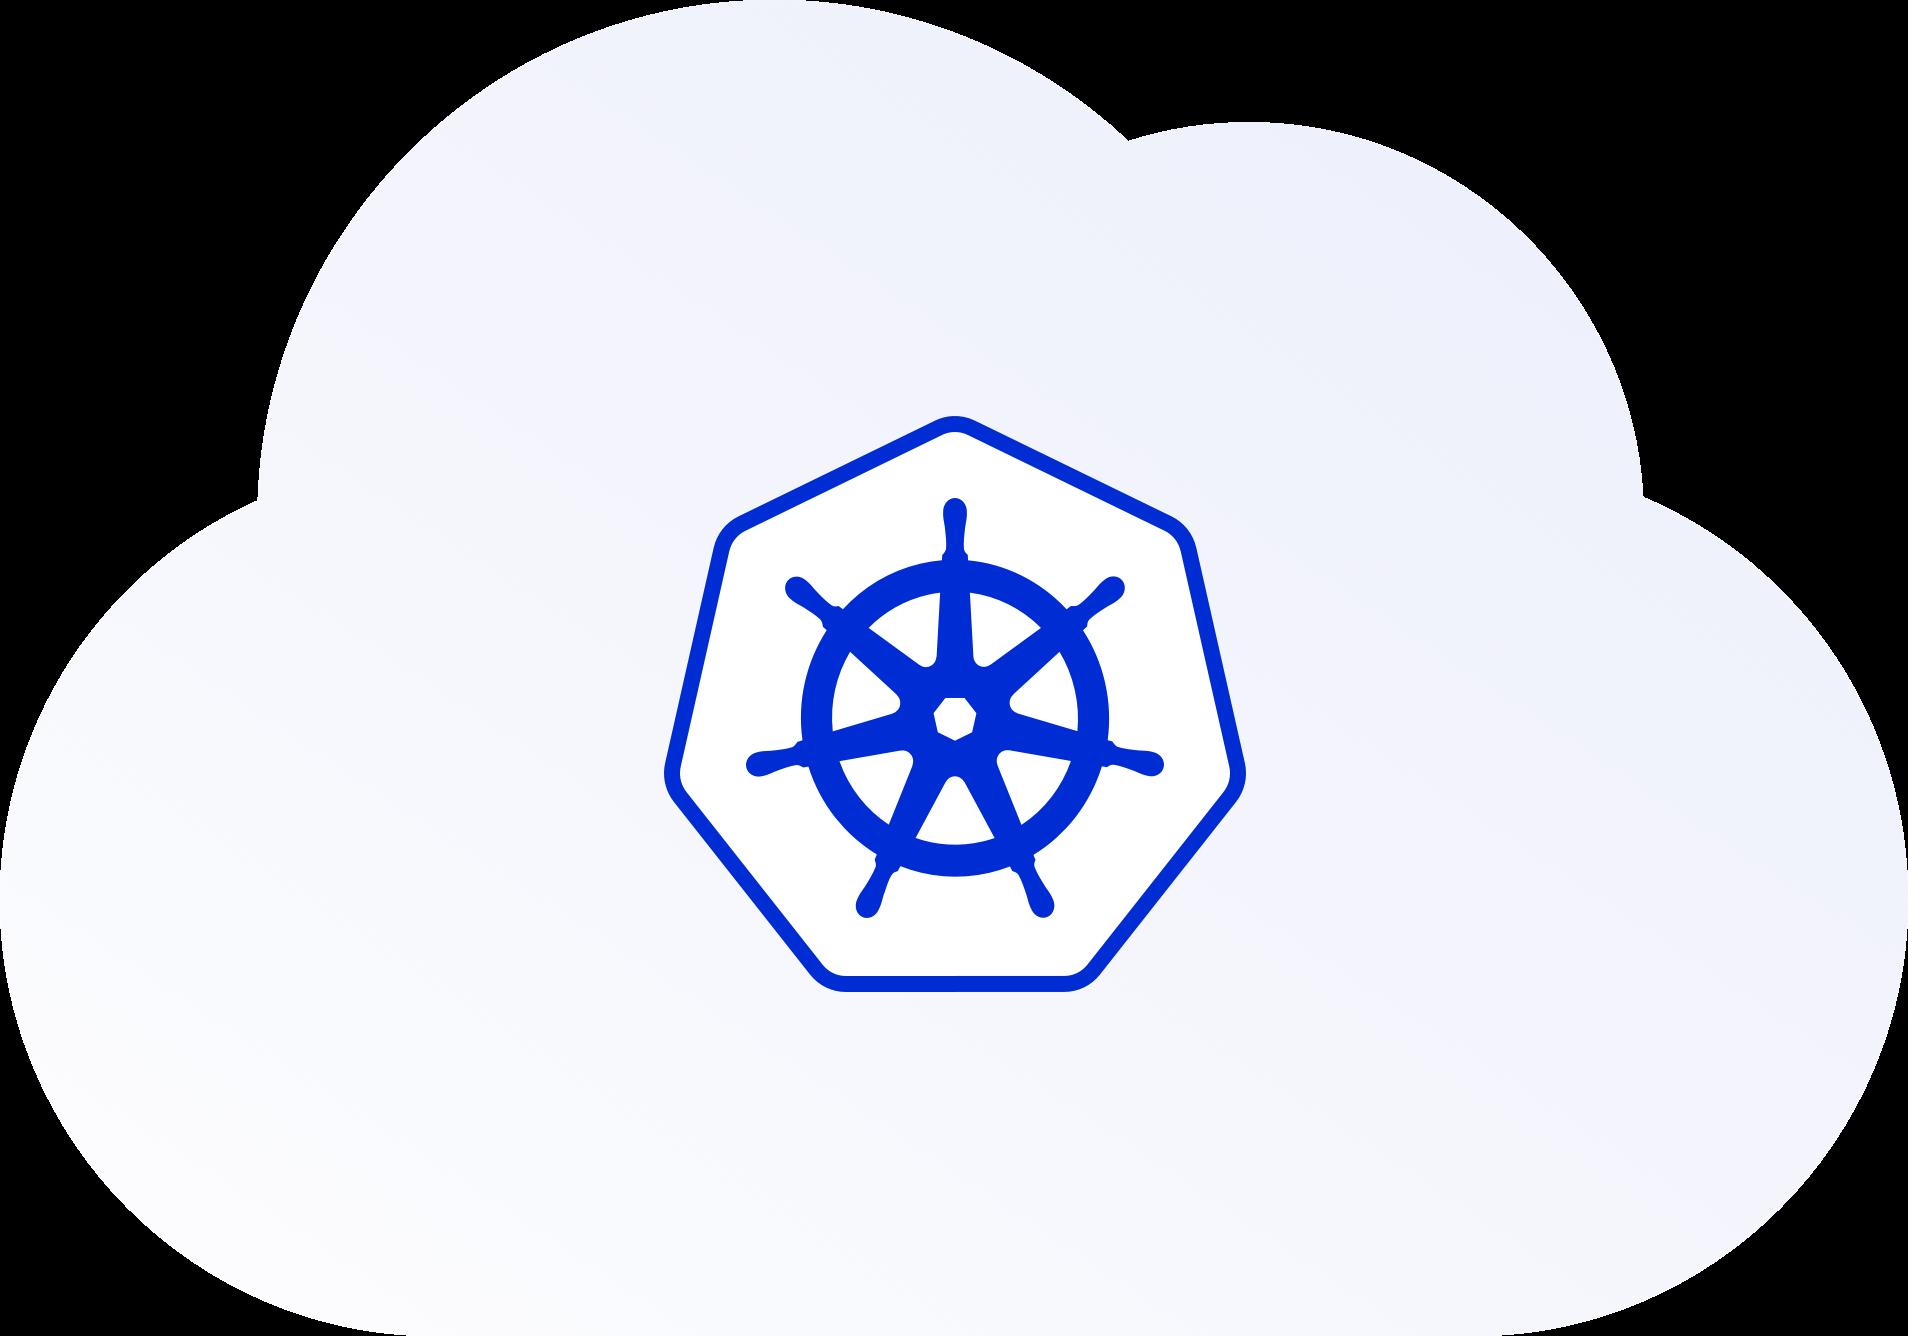 Cloudalize's GPU Private Cloud brings you Kubernetes GPU Cloud. pre-configured GPU-powered Kubernetes platform for enterprises, data scientists, researchers, and AI consultants